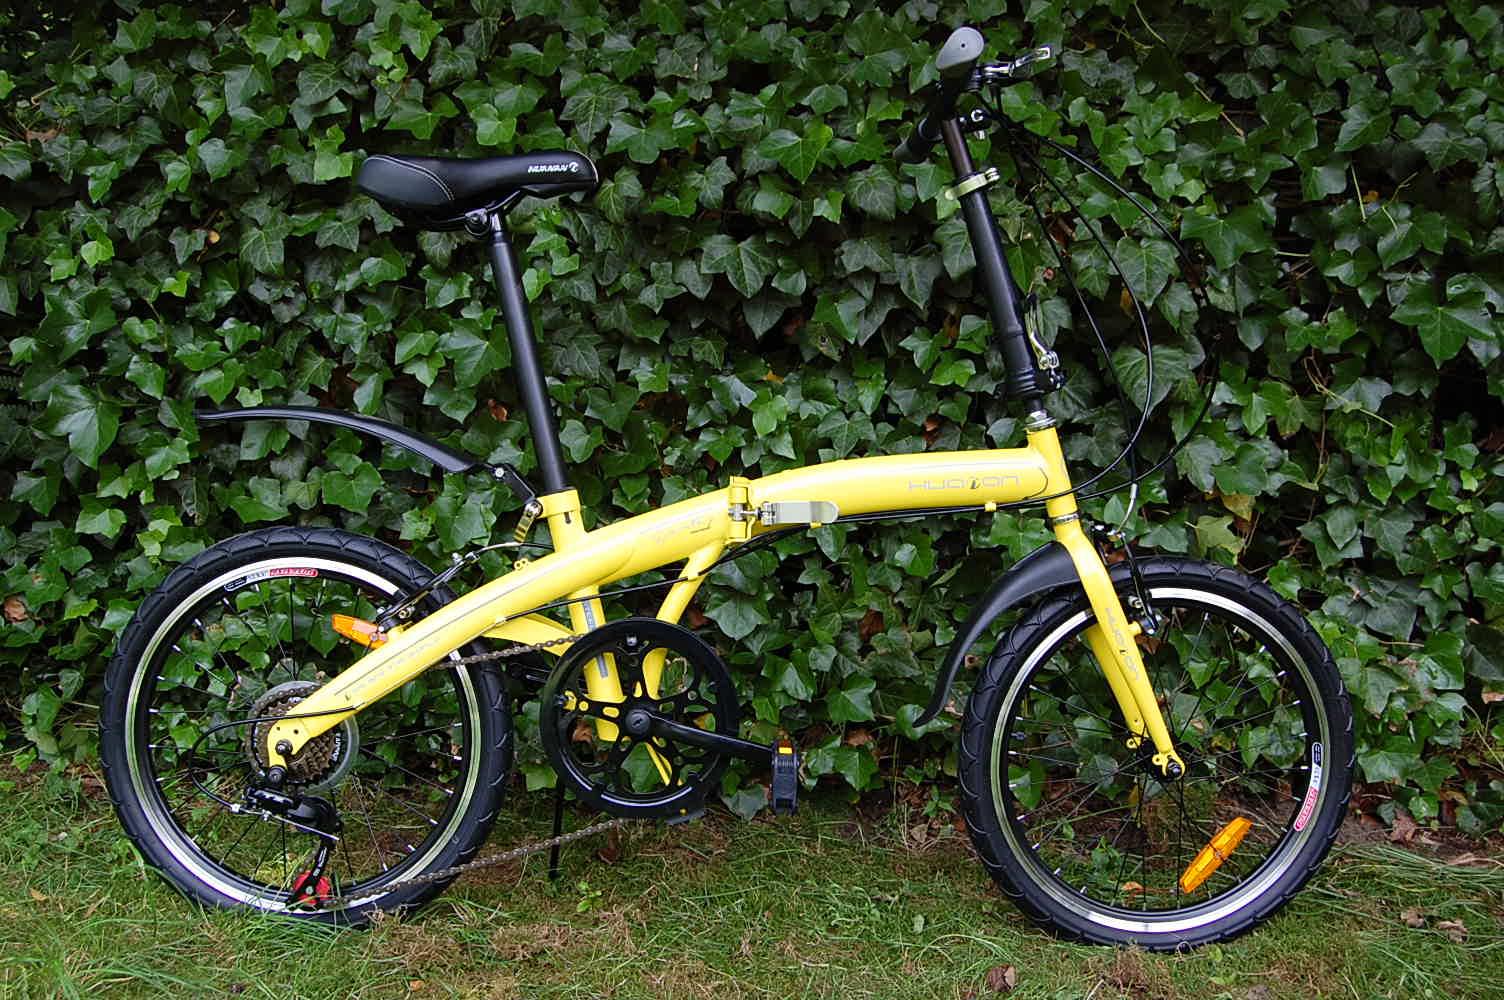 klapprad 20 zoll faltrad fahrrad 6 gang shimano wei neu beste qualit t bike. Black Bedroom Furniture Sets. Home Design Ideas